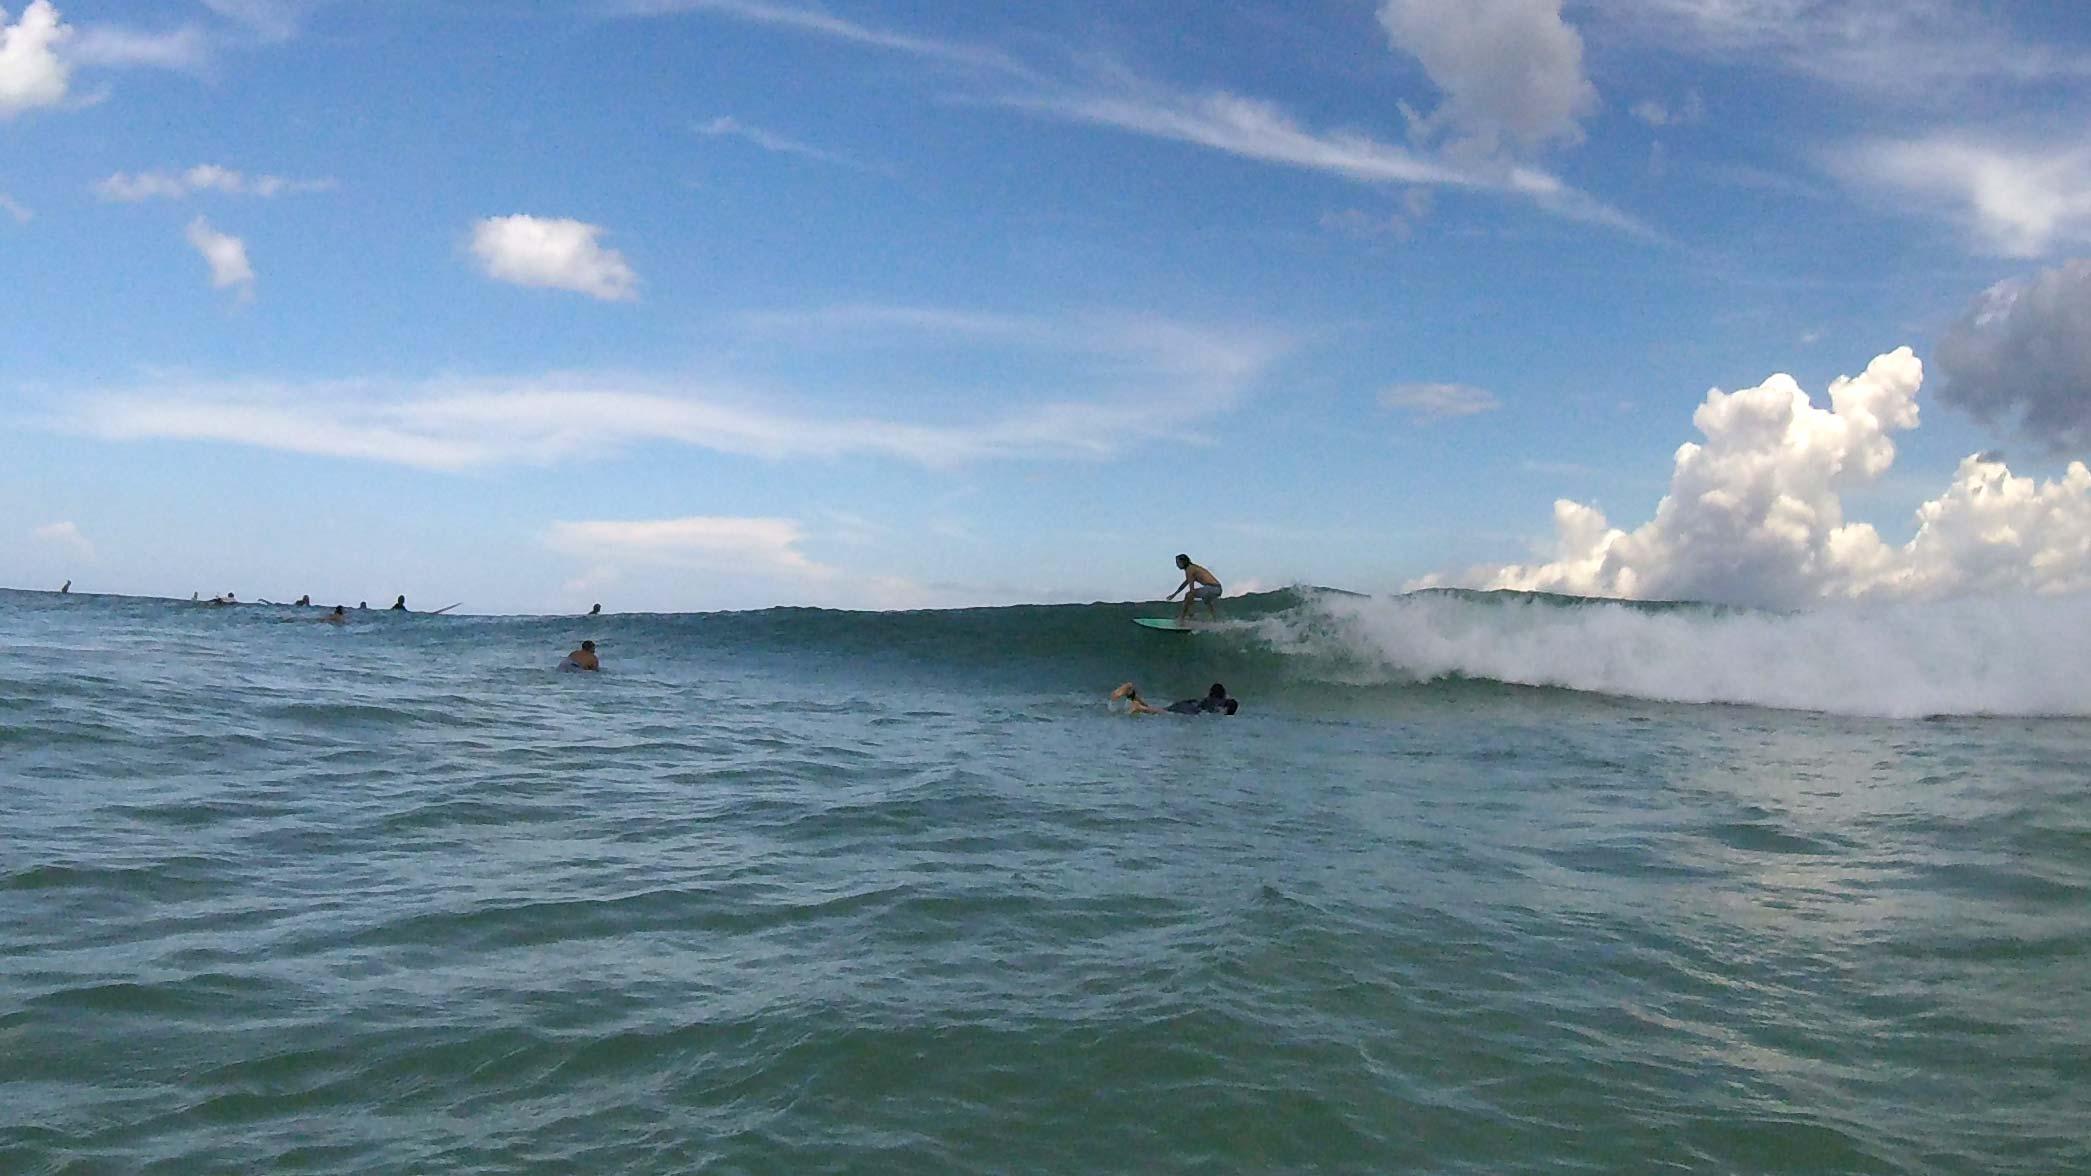 waves-tuesday-aug27th-xander